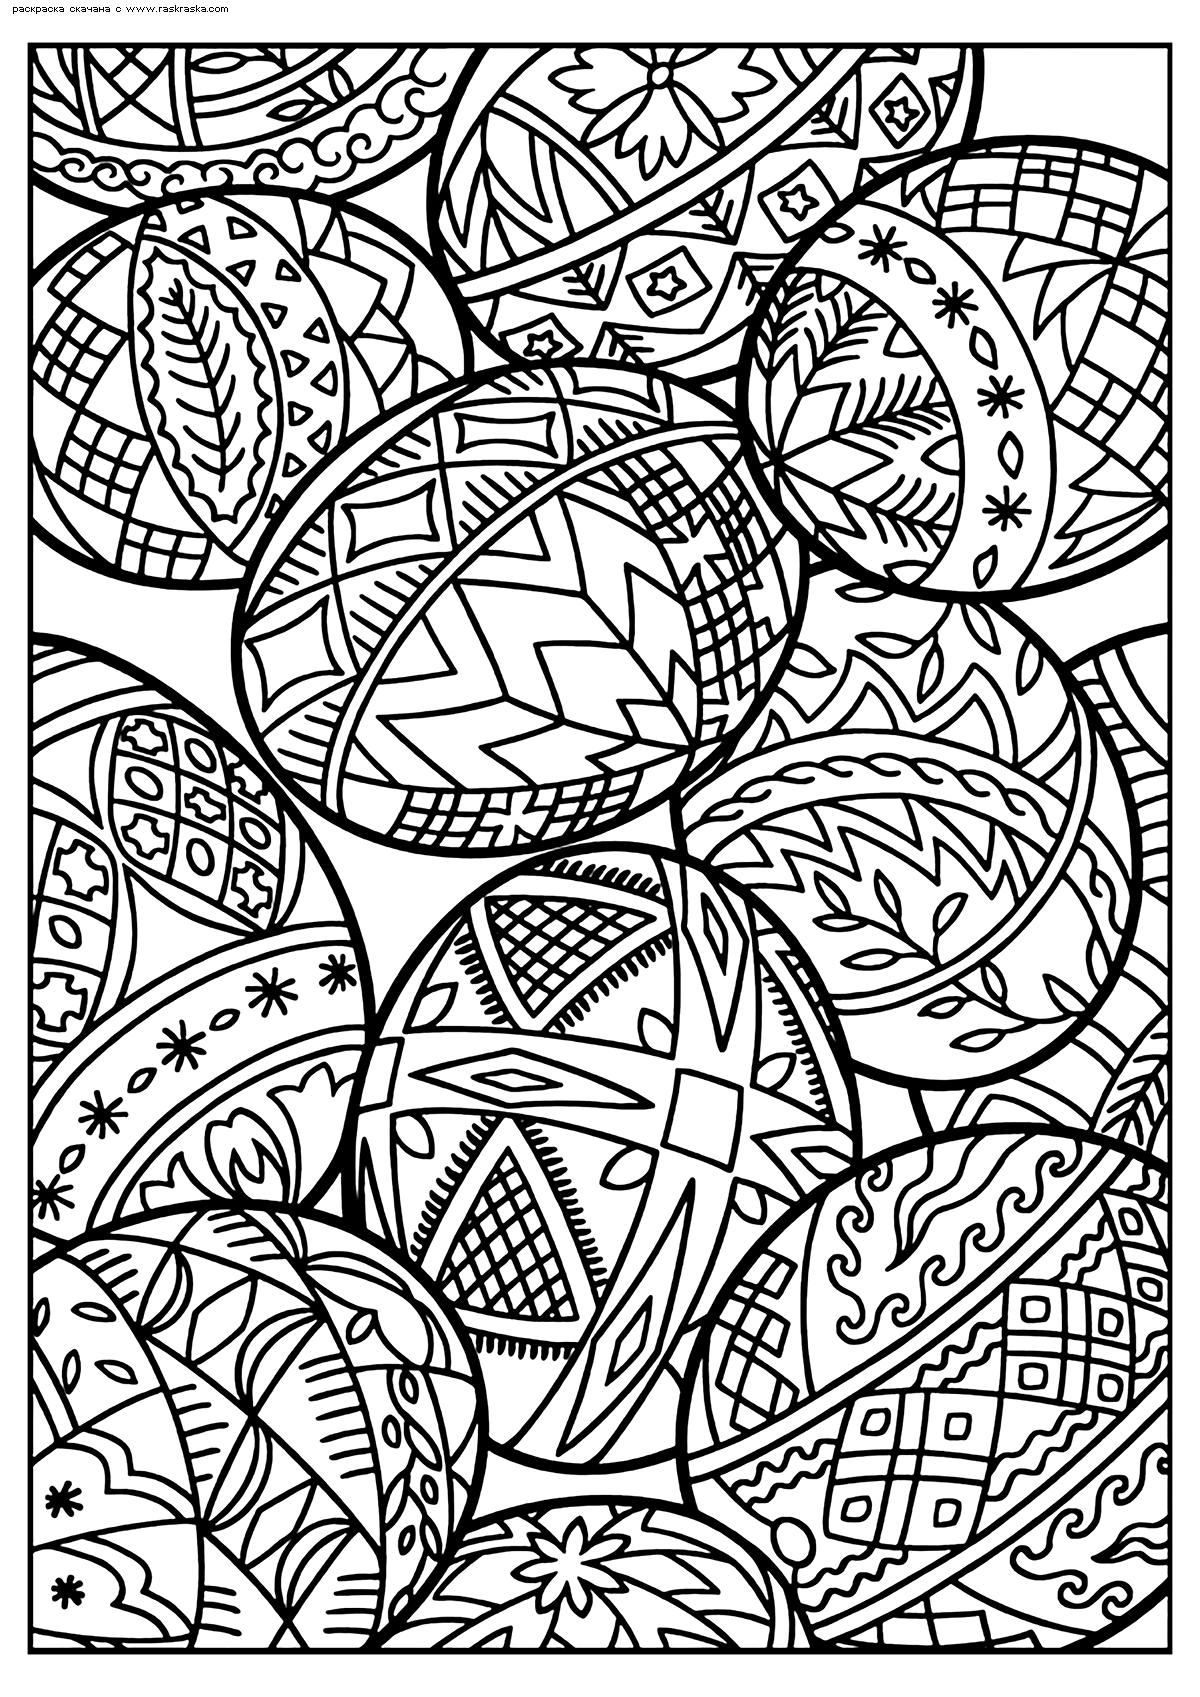 Раскраска Пасхальные яйца. Раскраска яйца, Пасха, антистресс